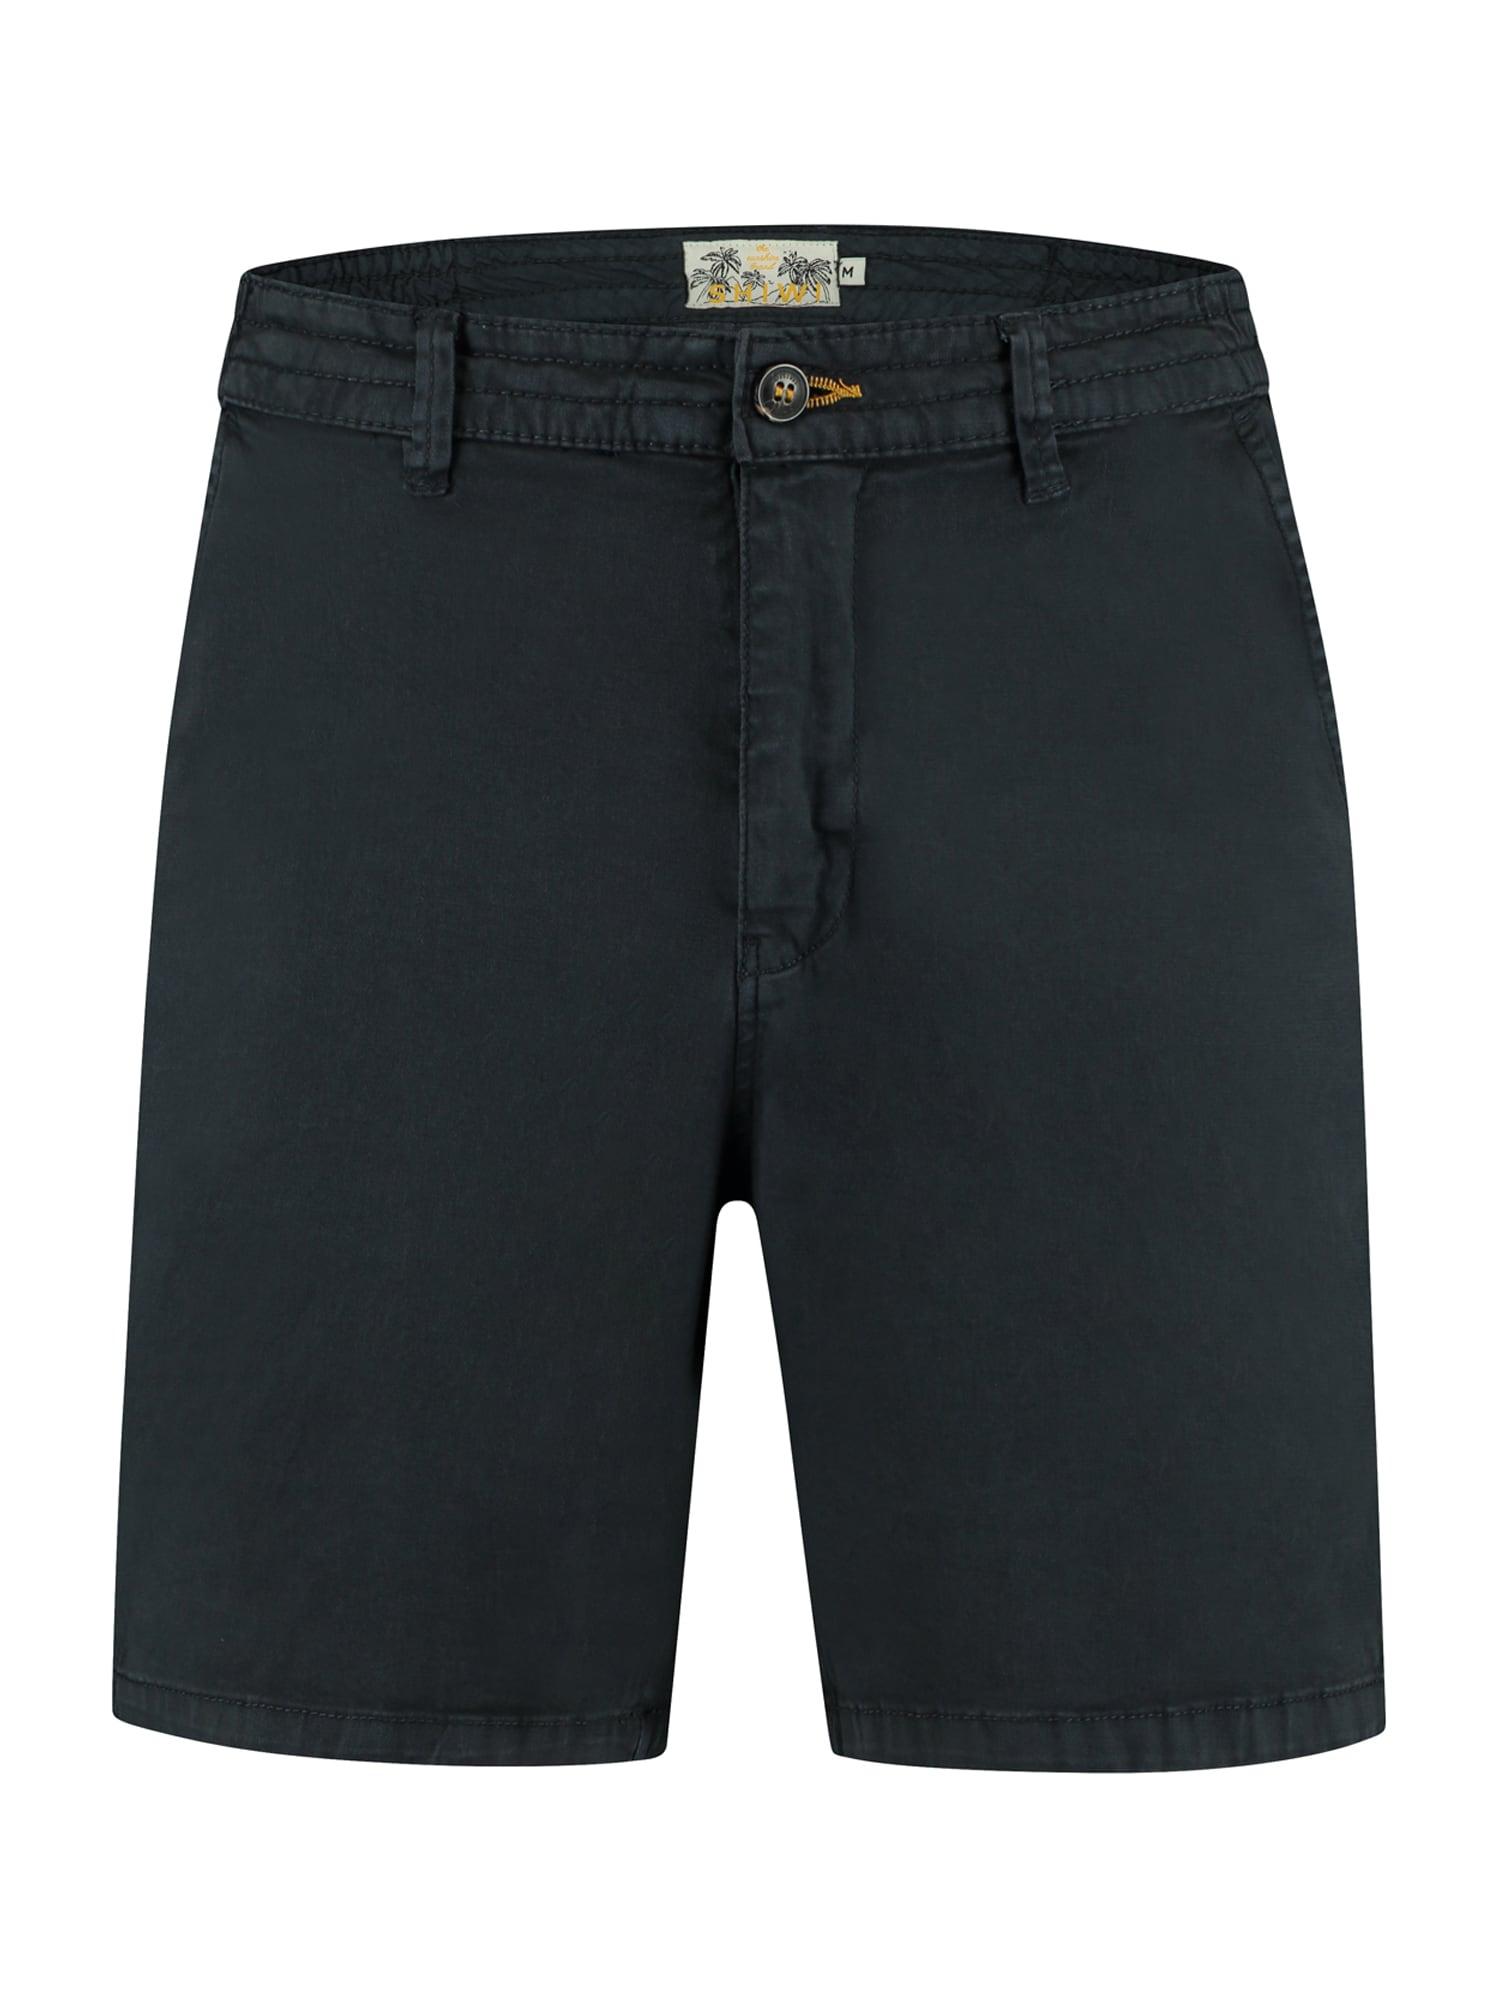 "Shiwi ""Chino"" stiliaus kelnės 'Jack' tamsiai mėlyna"